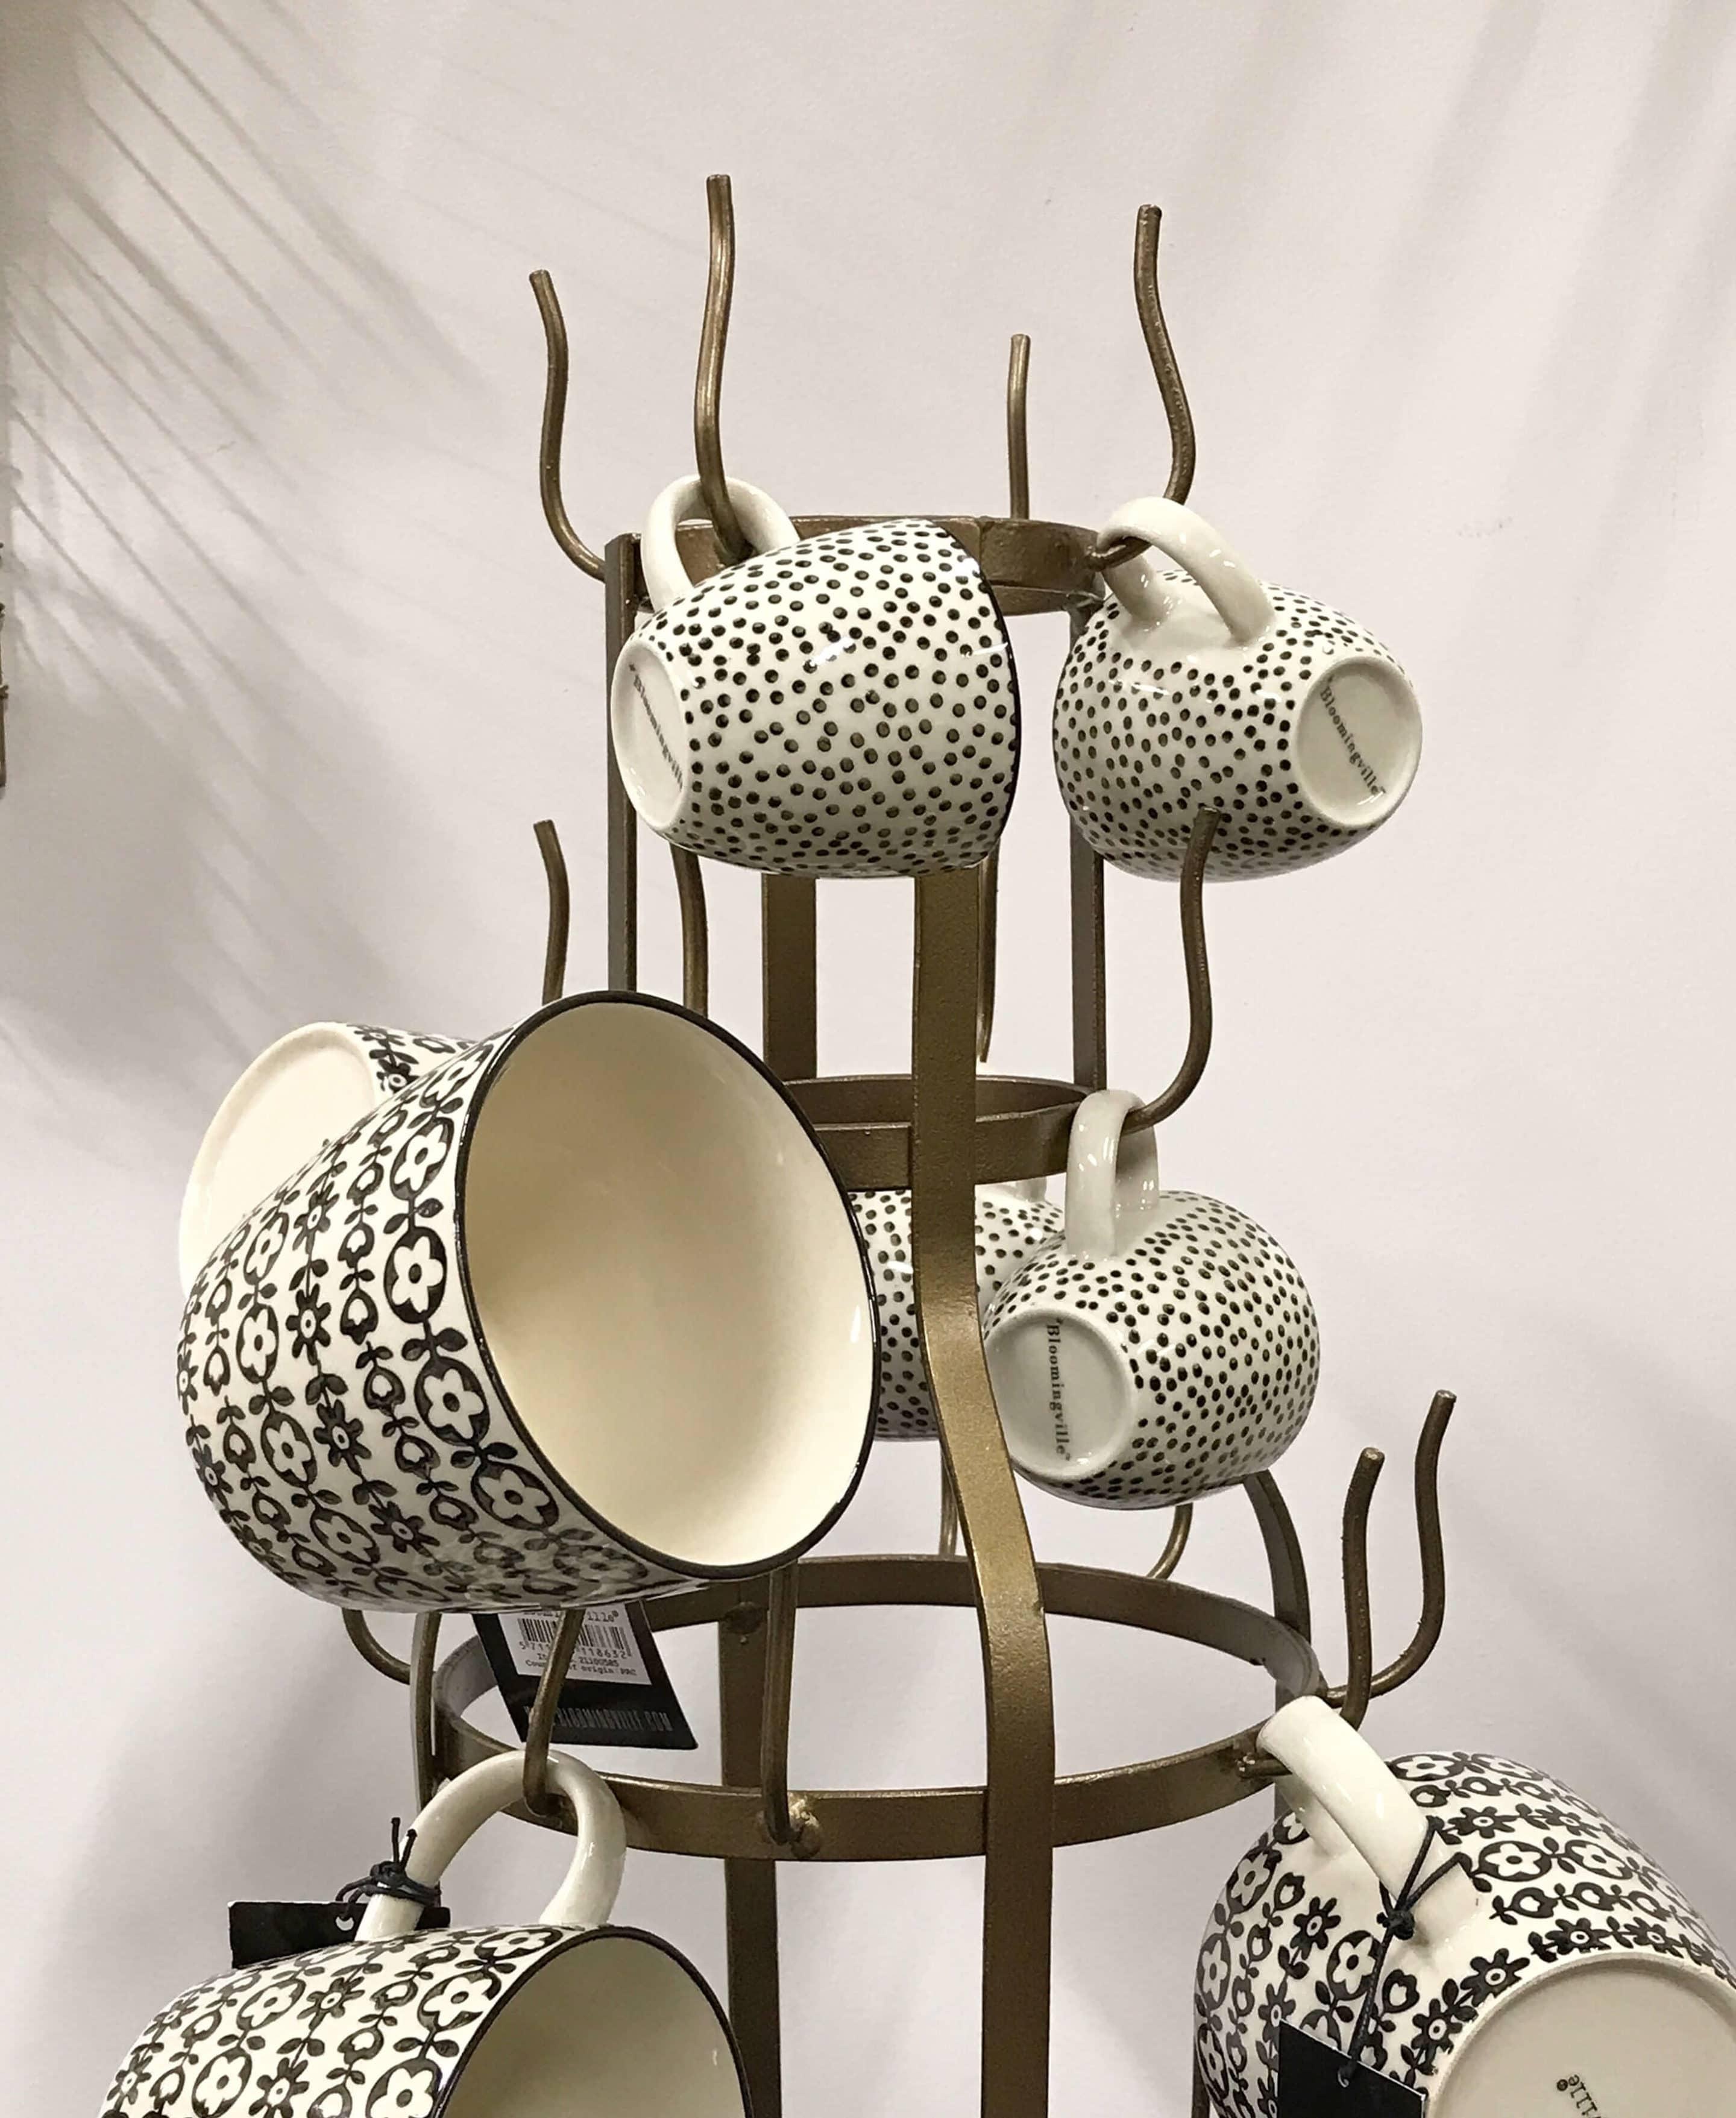 finest porte mugs dor madam stoltz with madam stoltz lampe. Black Bedroom Furniture Sets. Home Design Ideas